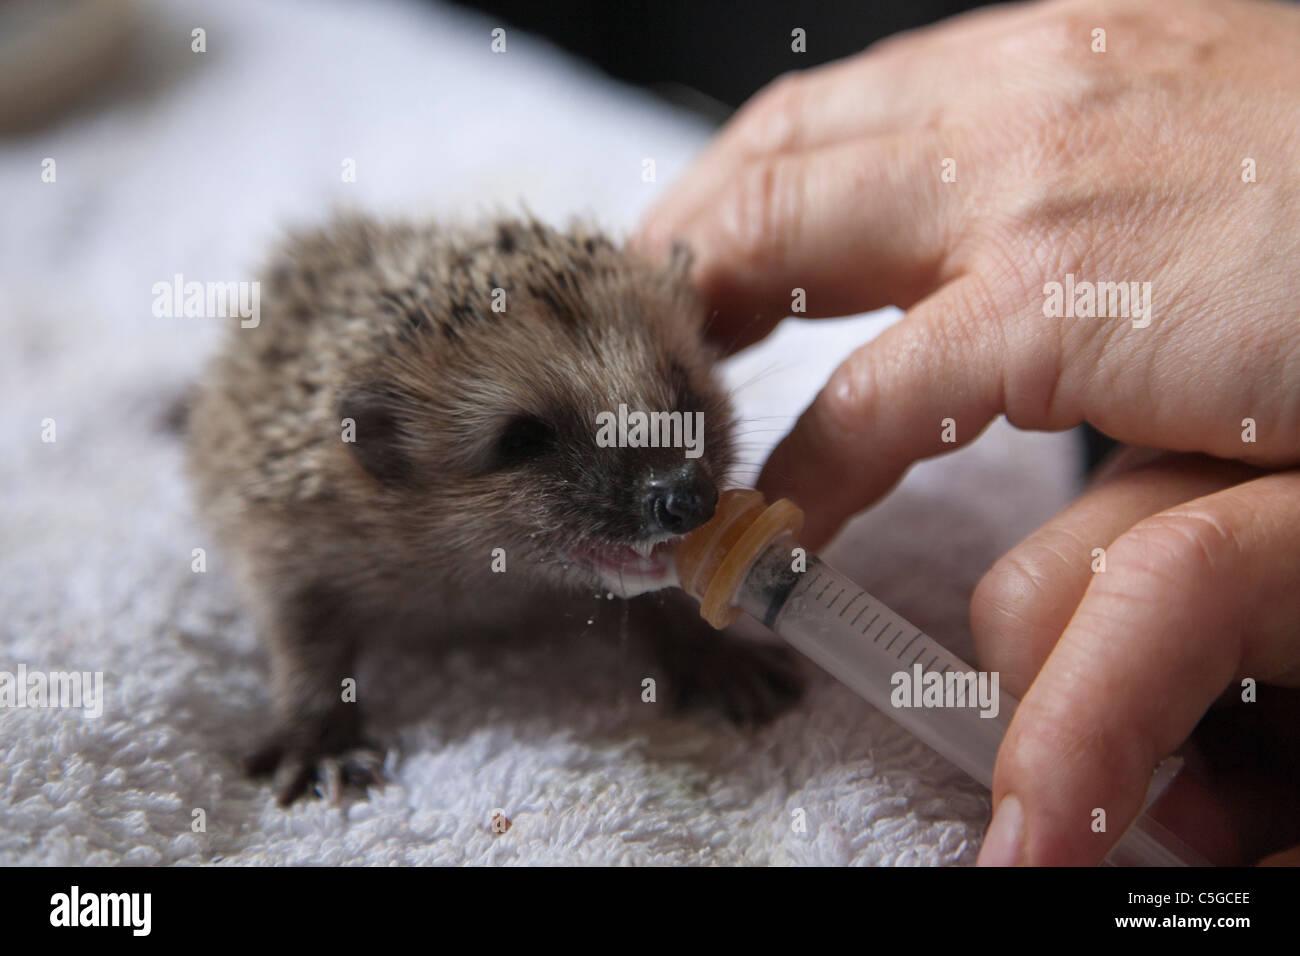 Feeding a four week old hedgehog baby - Stock Image